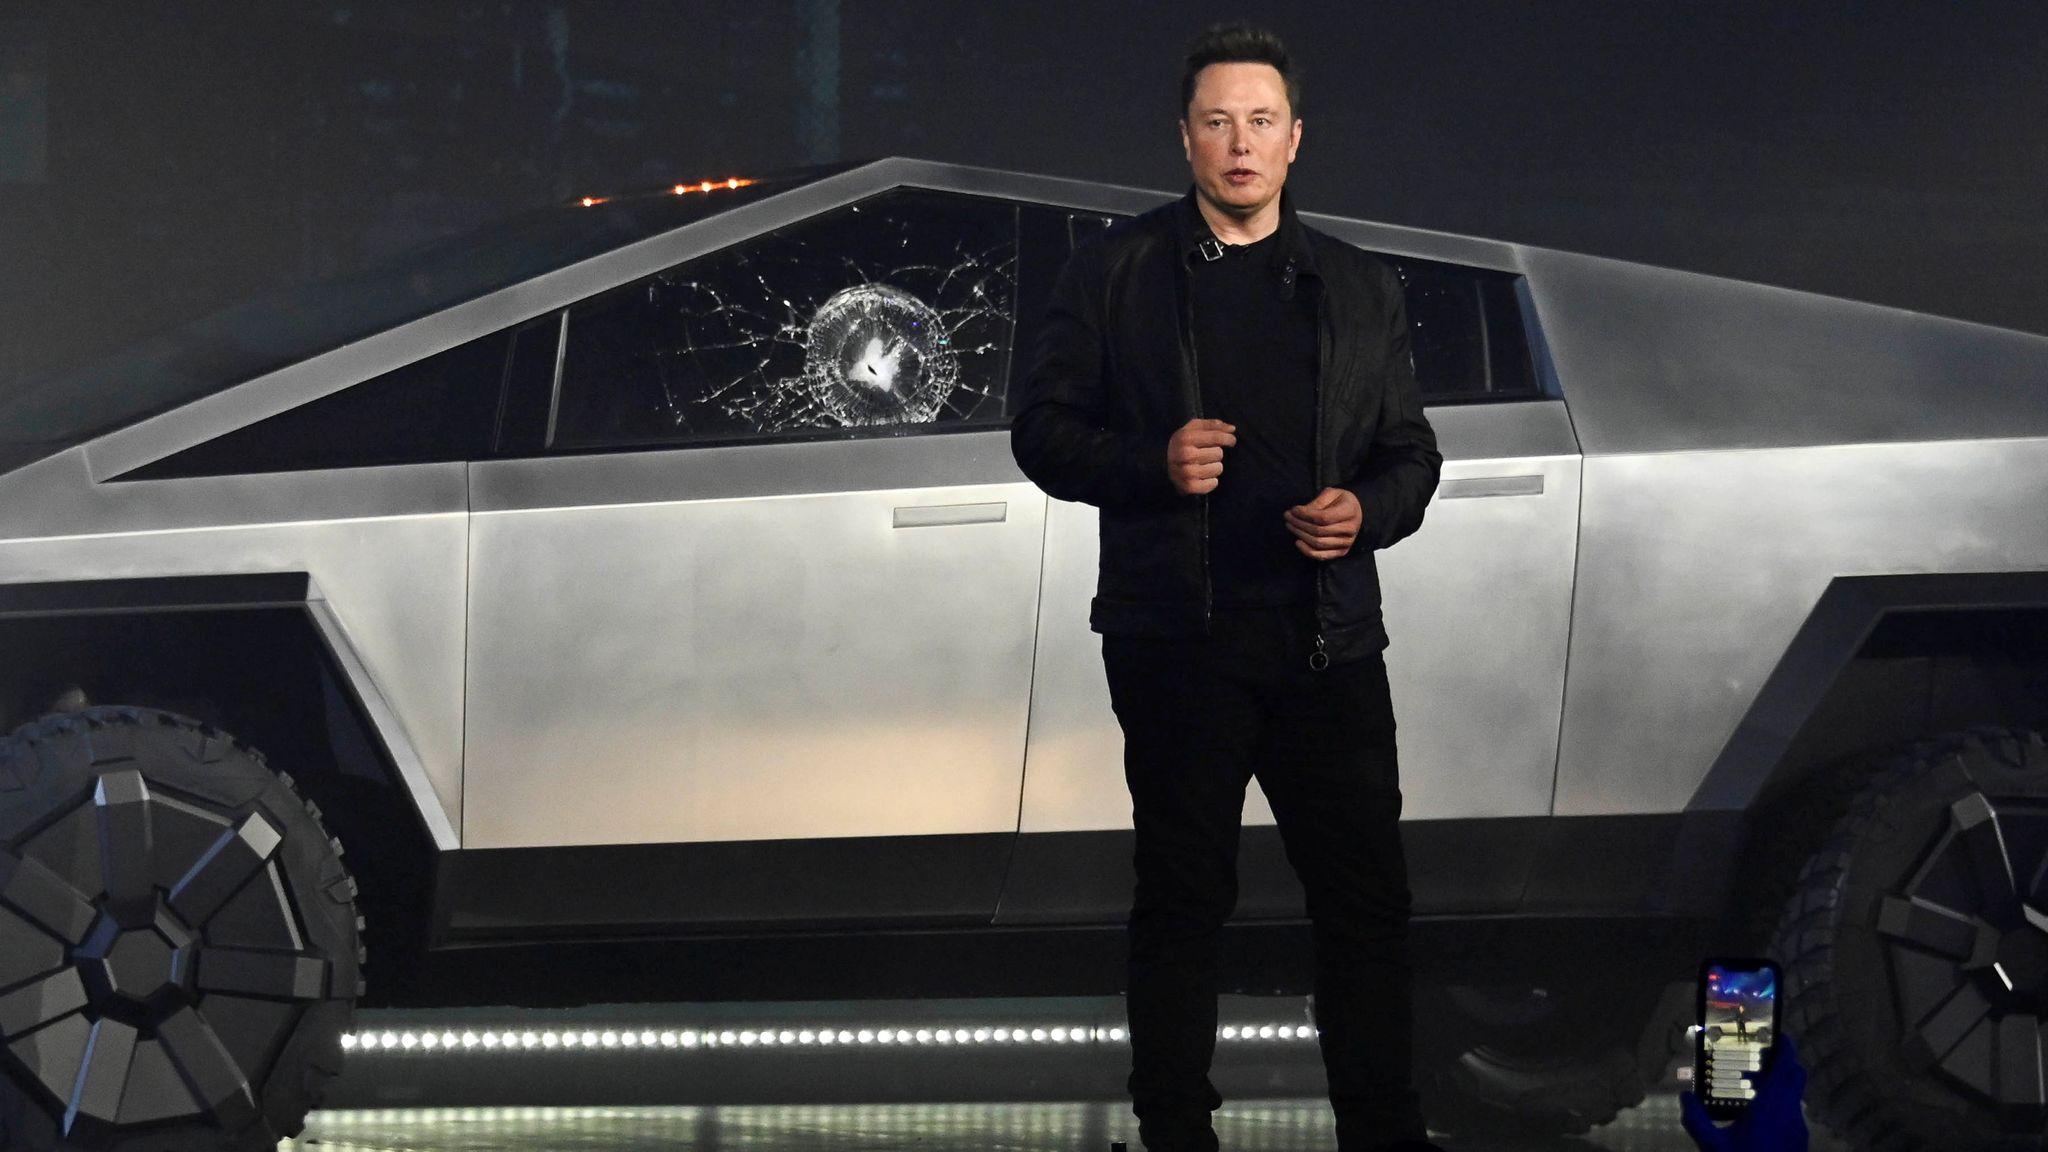 Elon Musk Tesla Boss Reveals Why Windows Of Cybertruck Smashed Business News Sky News